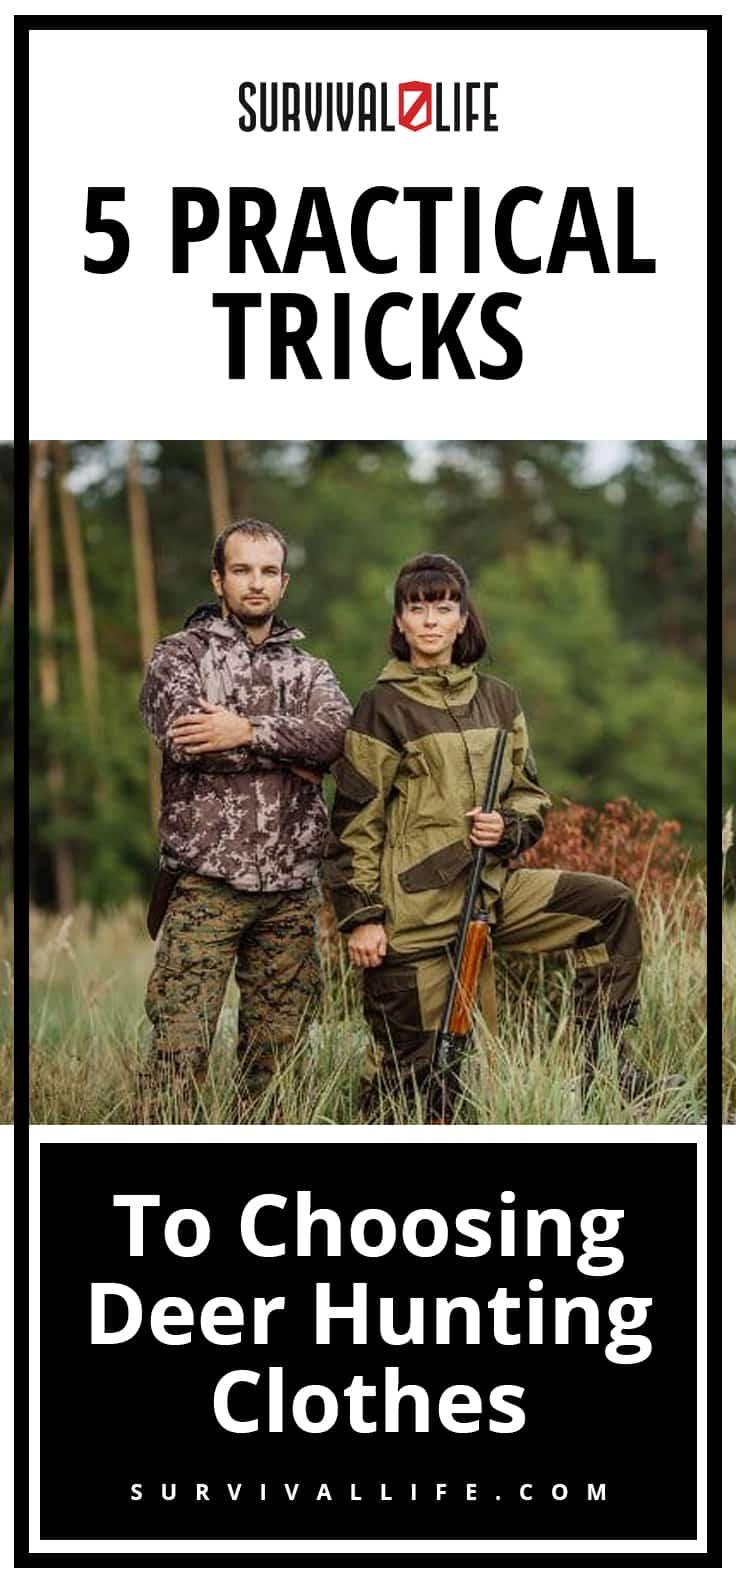 5 Practical Tricks To Choosing Deer Hunting Clothes